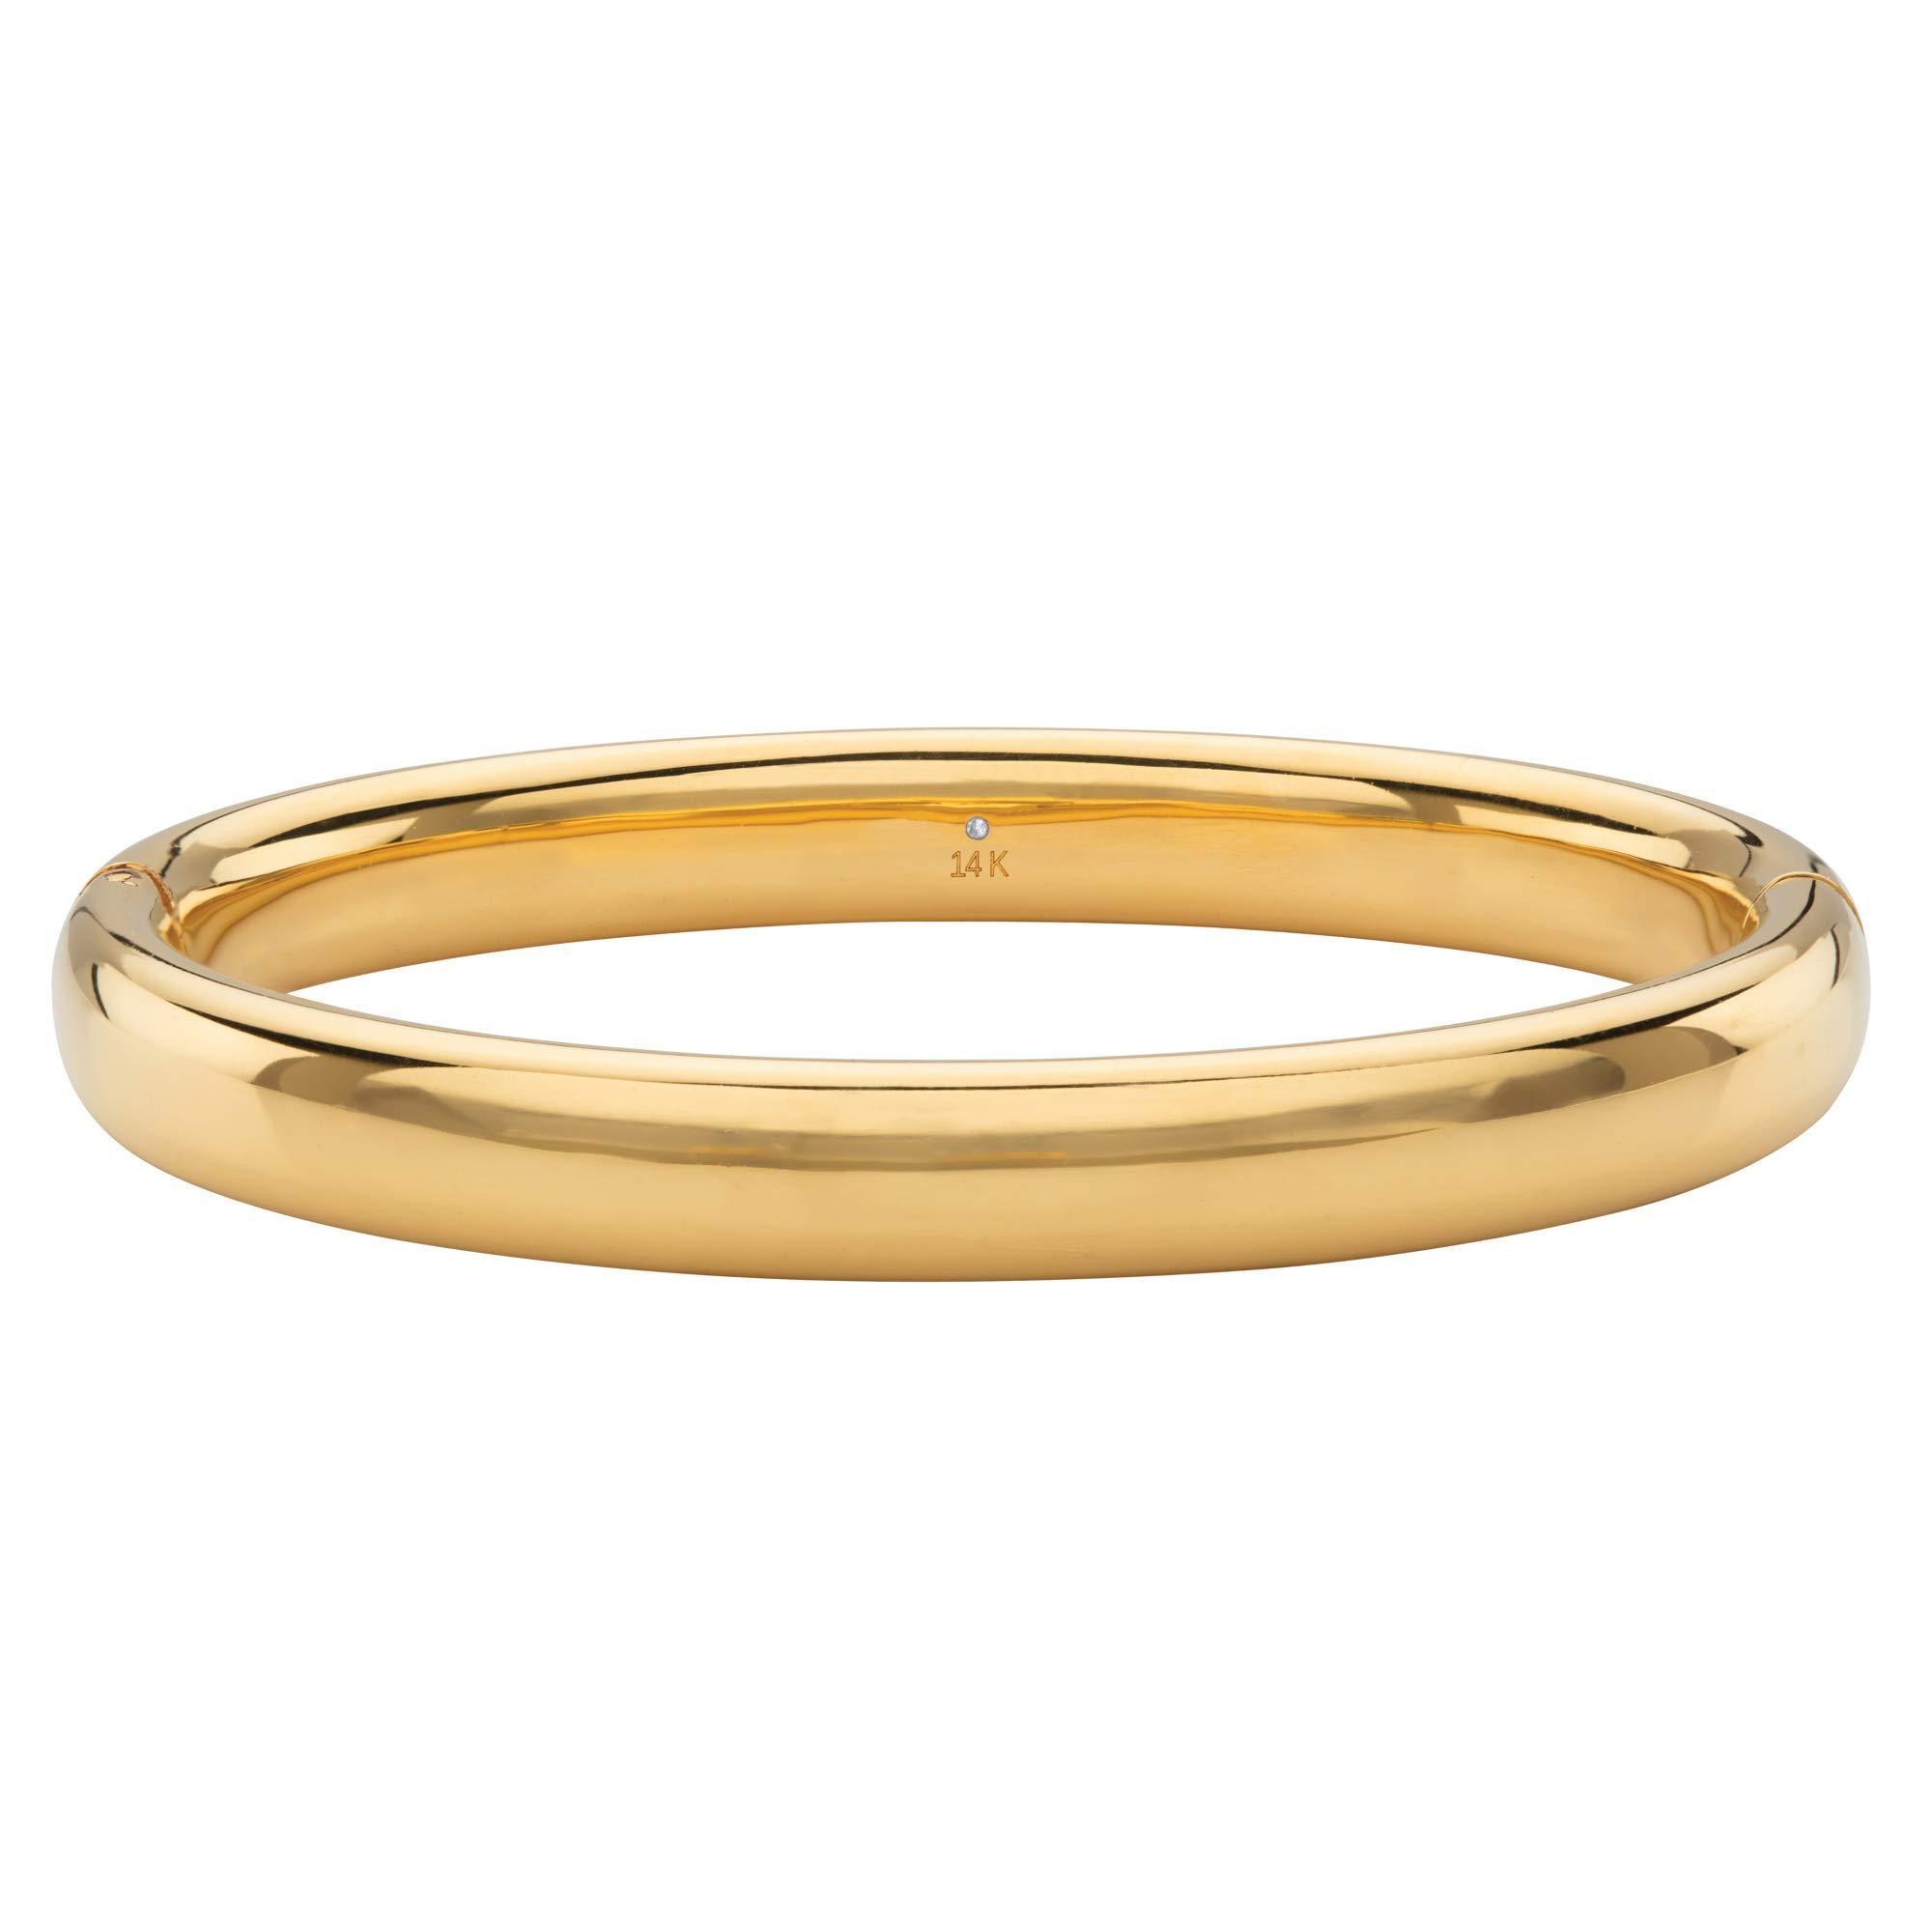 14K Yellow Gold Hollow Nano Diamond Resin Filled Magnetic Bangle Bracelet 8''